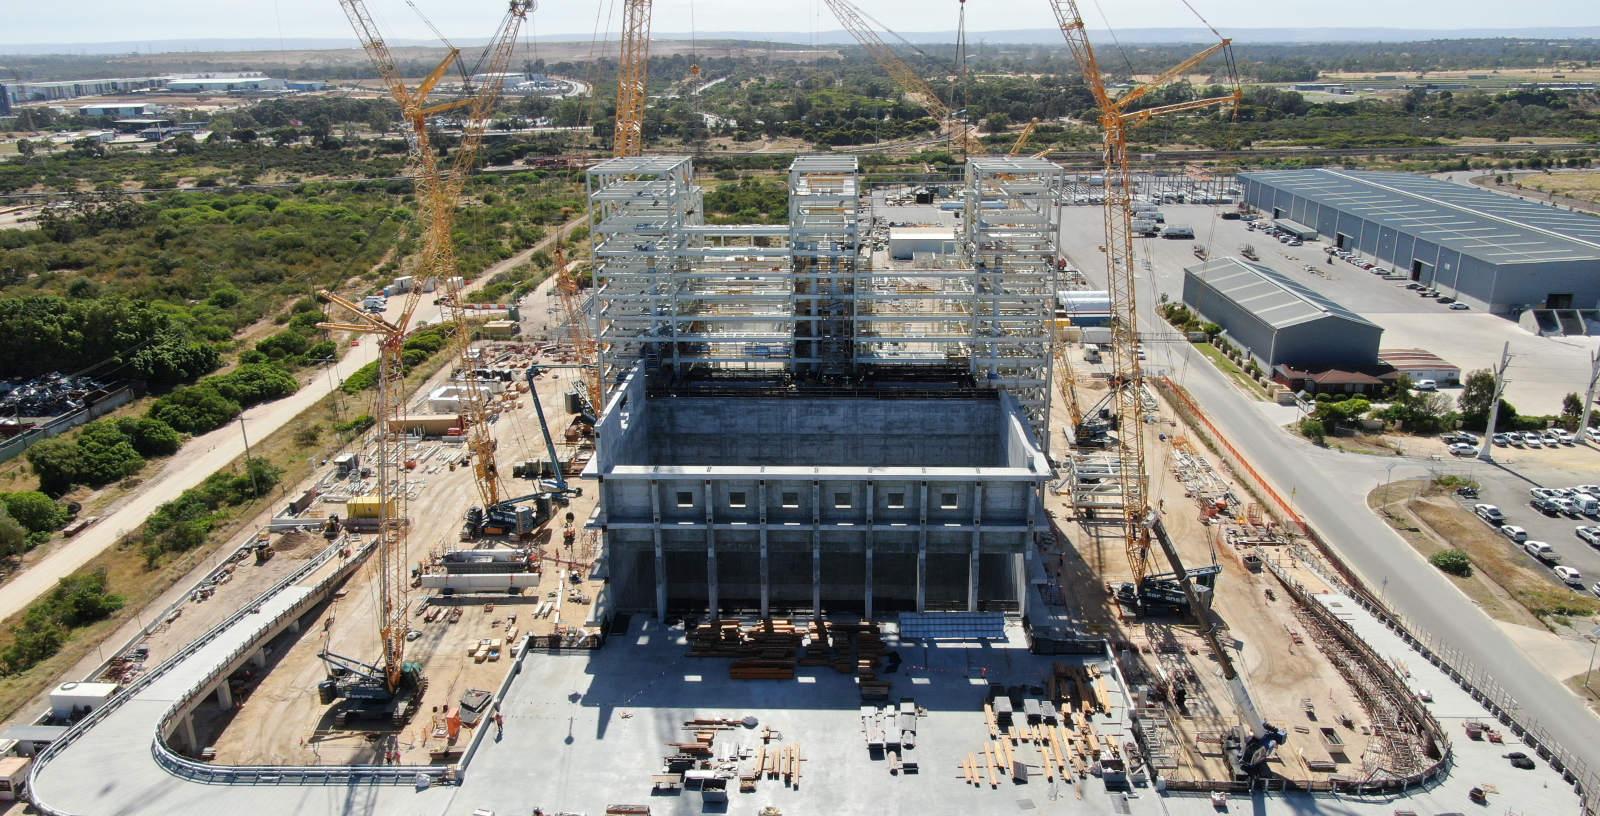 Kwinana_Waste_To_Energy_Plant_Australia_Acciona_IDOM_20